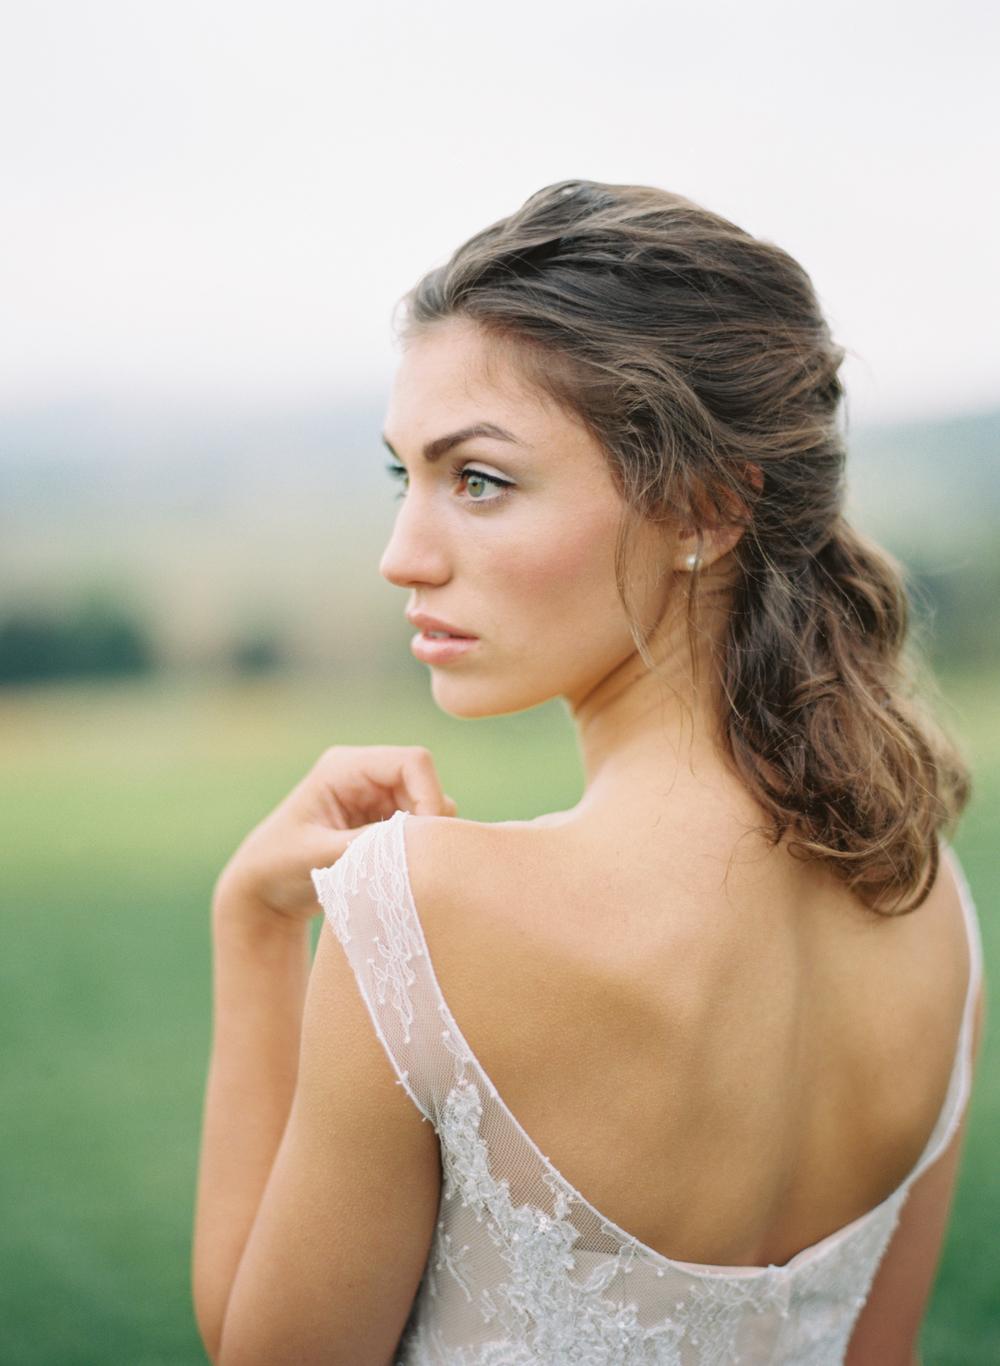 elisa-bricker-virginia-wedding-photographer